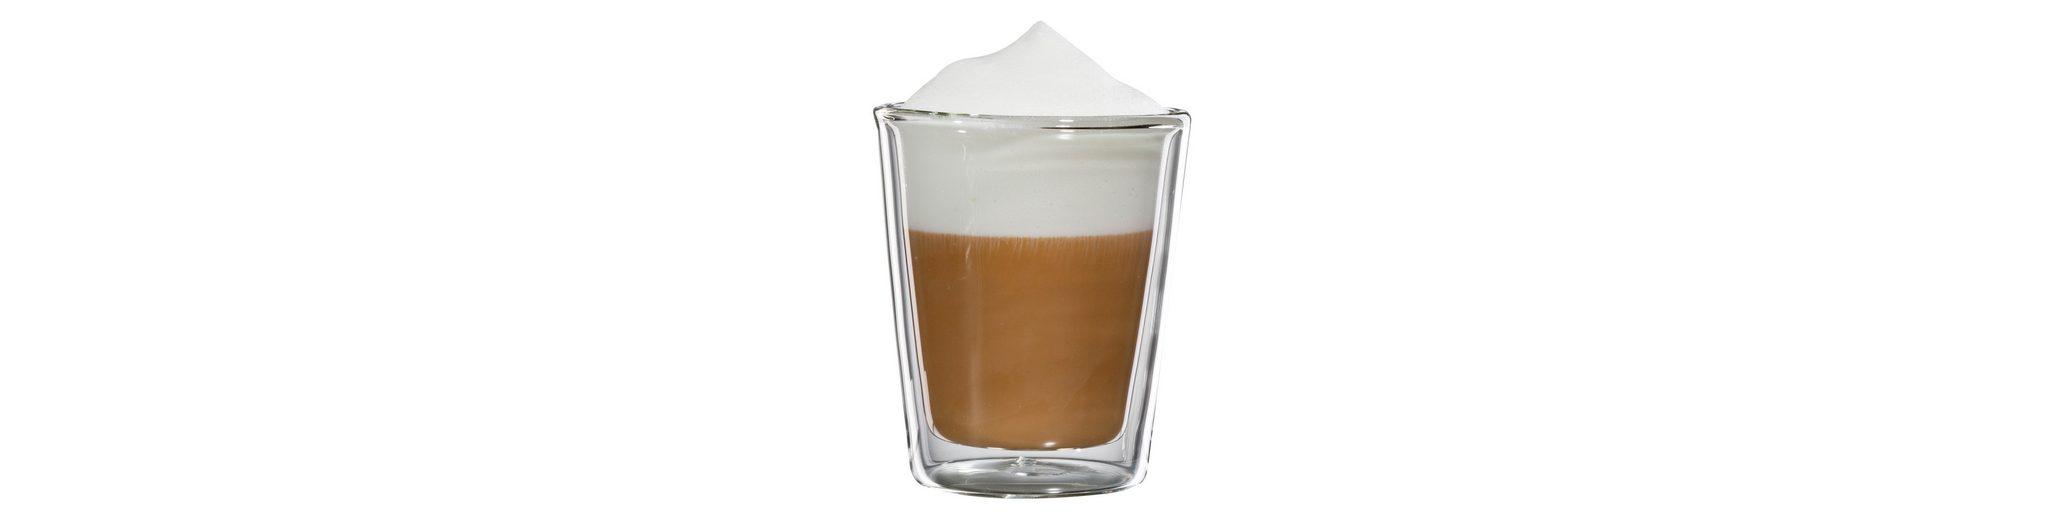 bloomix Cappuccino-Glas, 4er Set, »Milano«, 200 ml